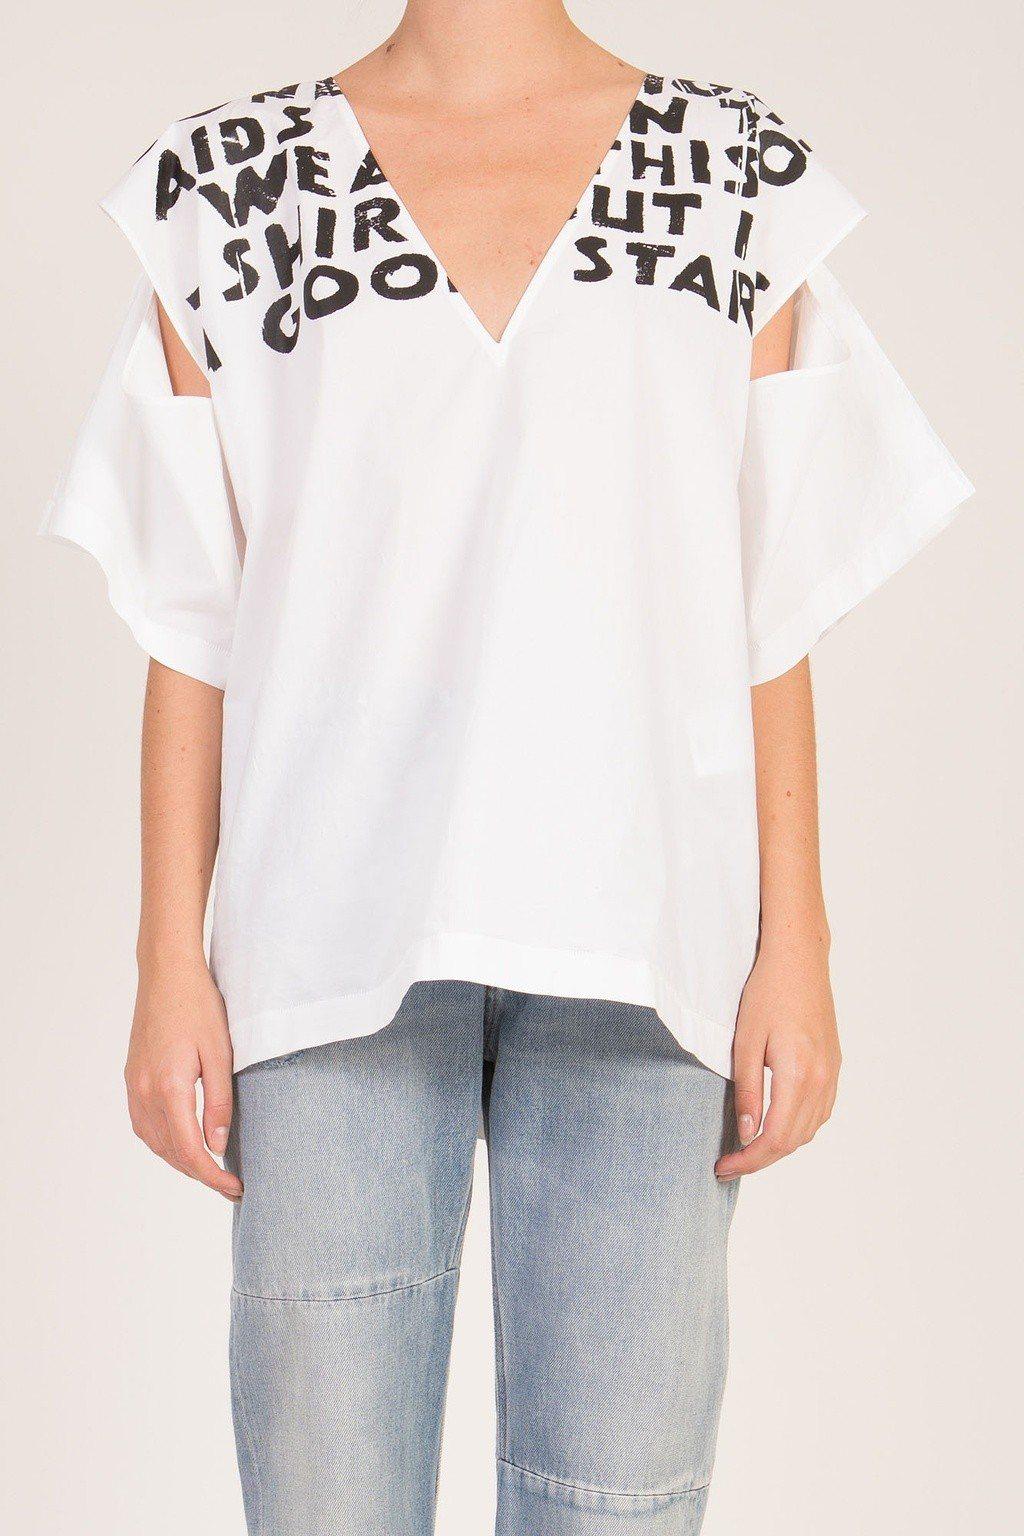 MM6經典Slogan 開袖上衣,售價17,800元。圖/MM6提供